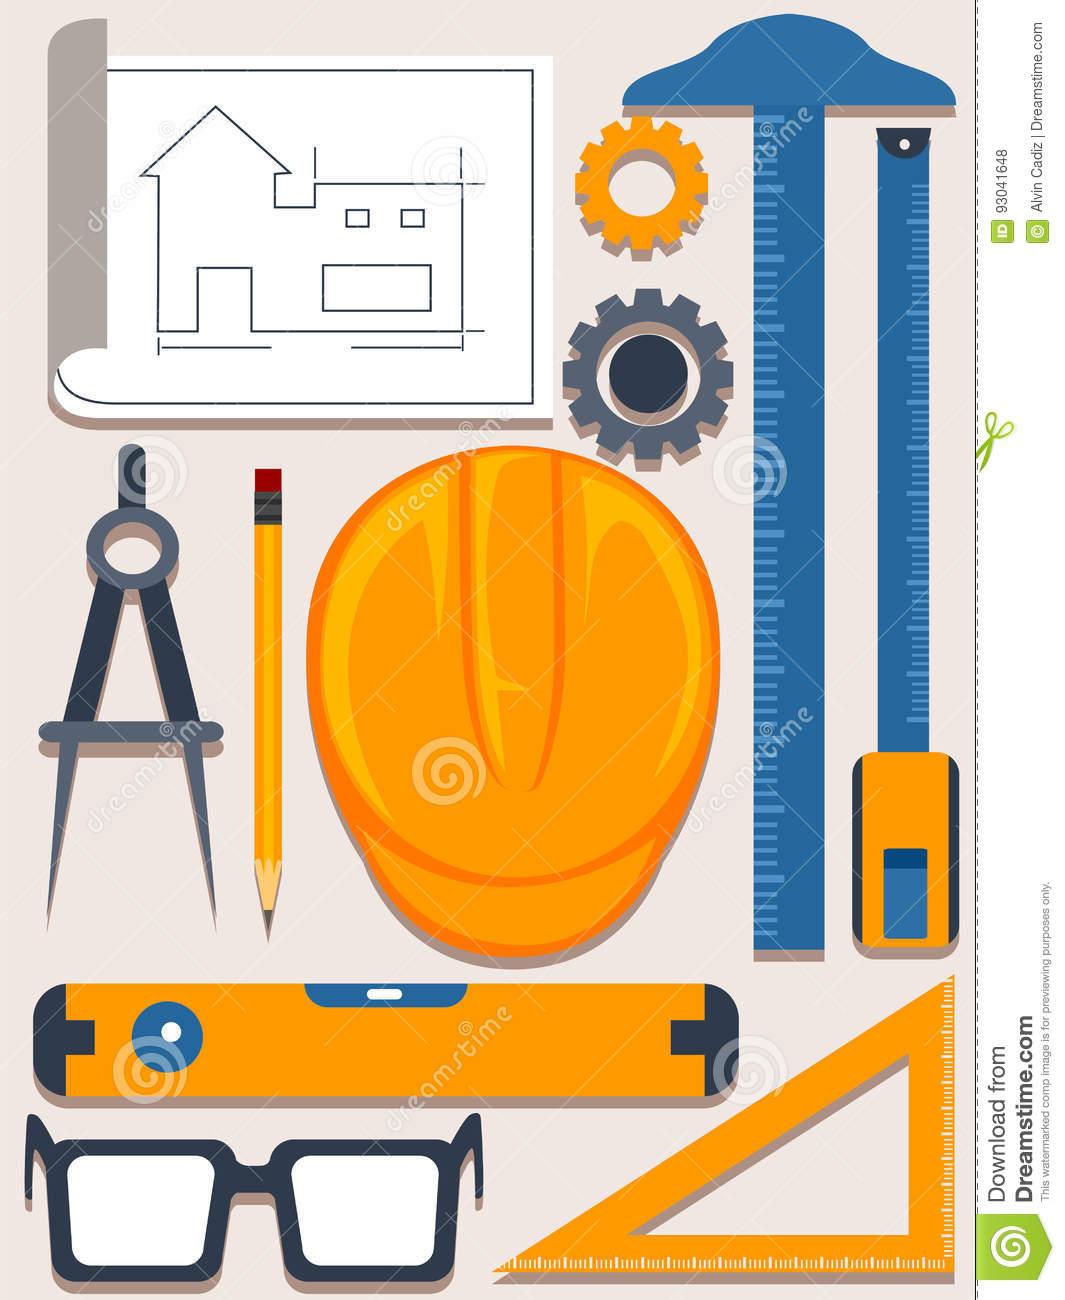 7394 Tools free clipart.